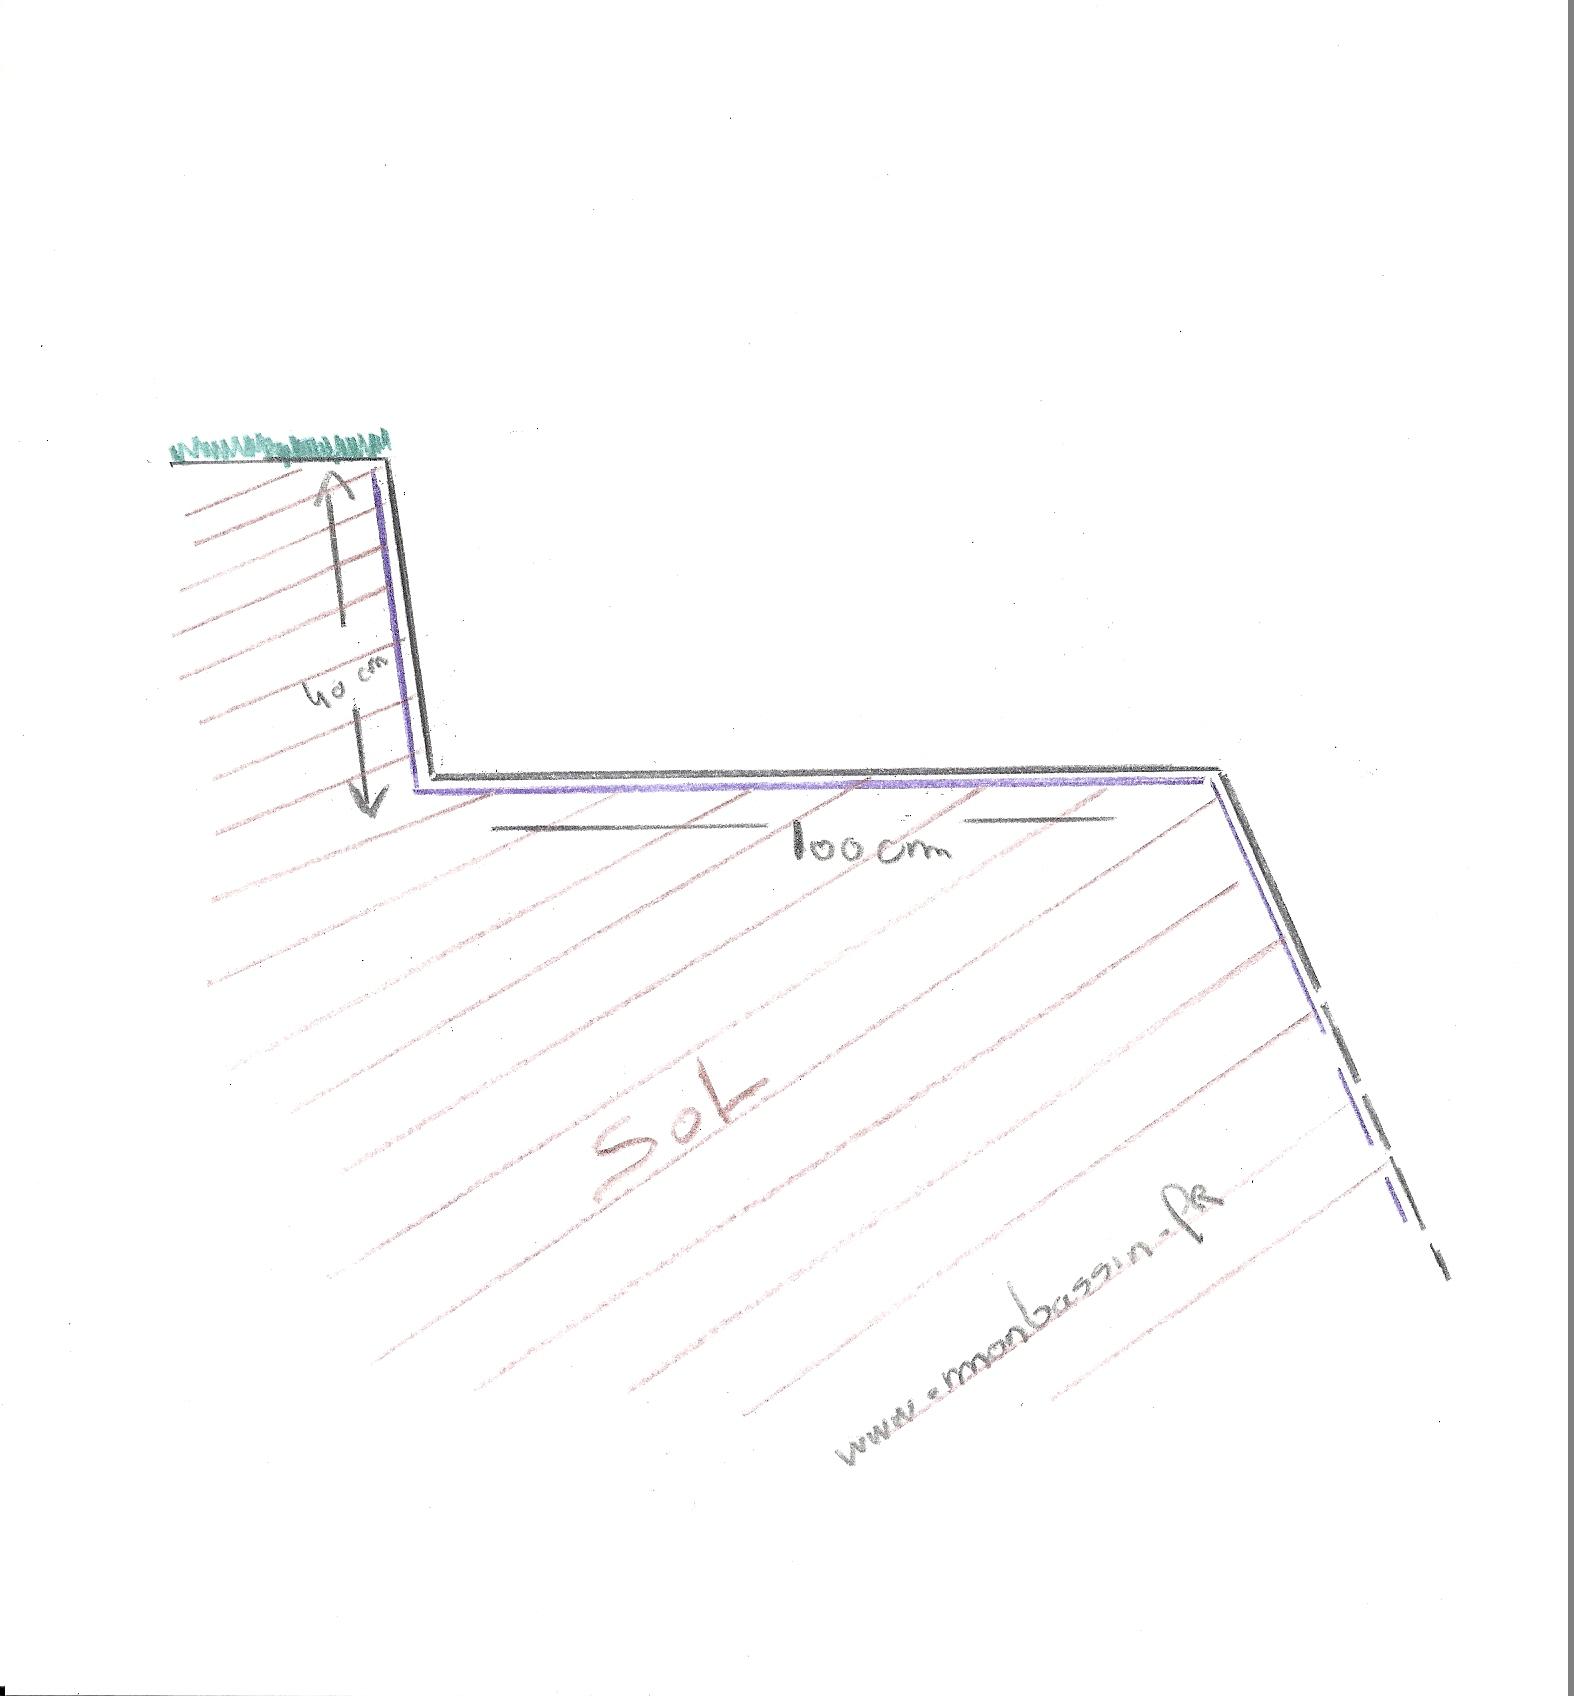 terrassement forme du lagunage